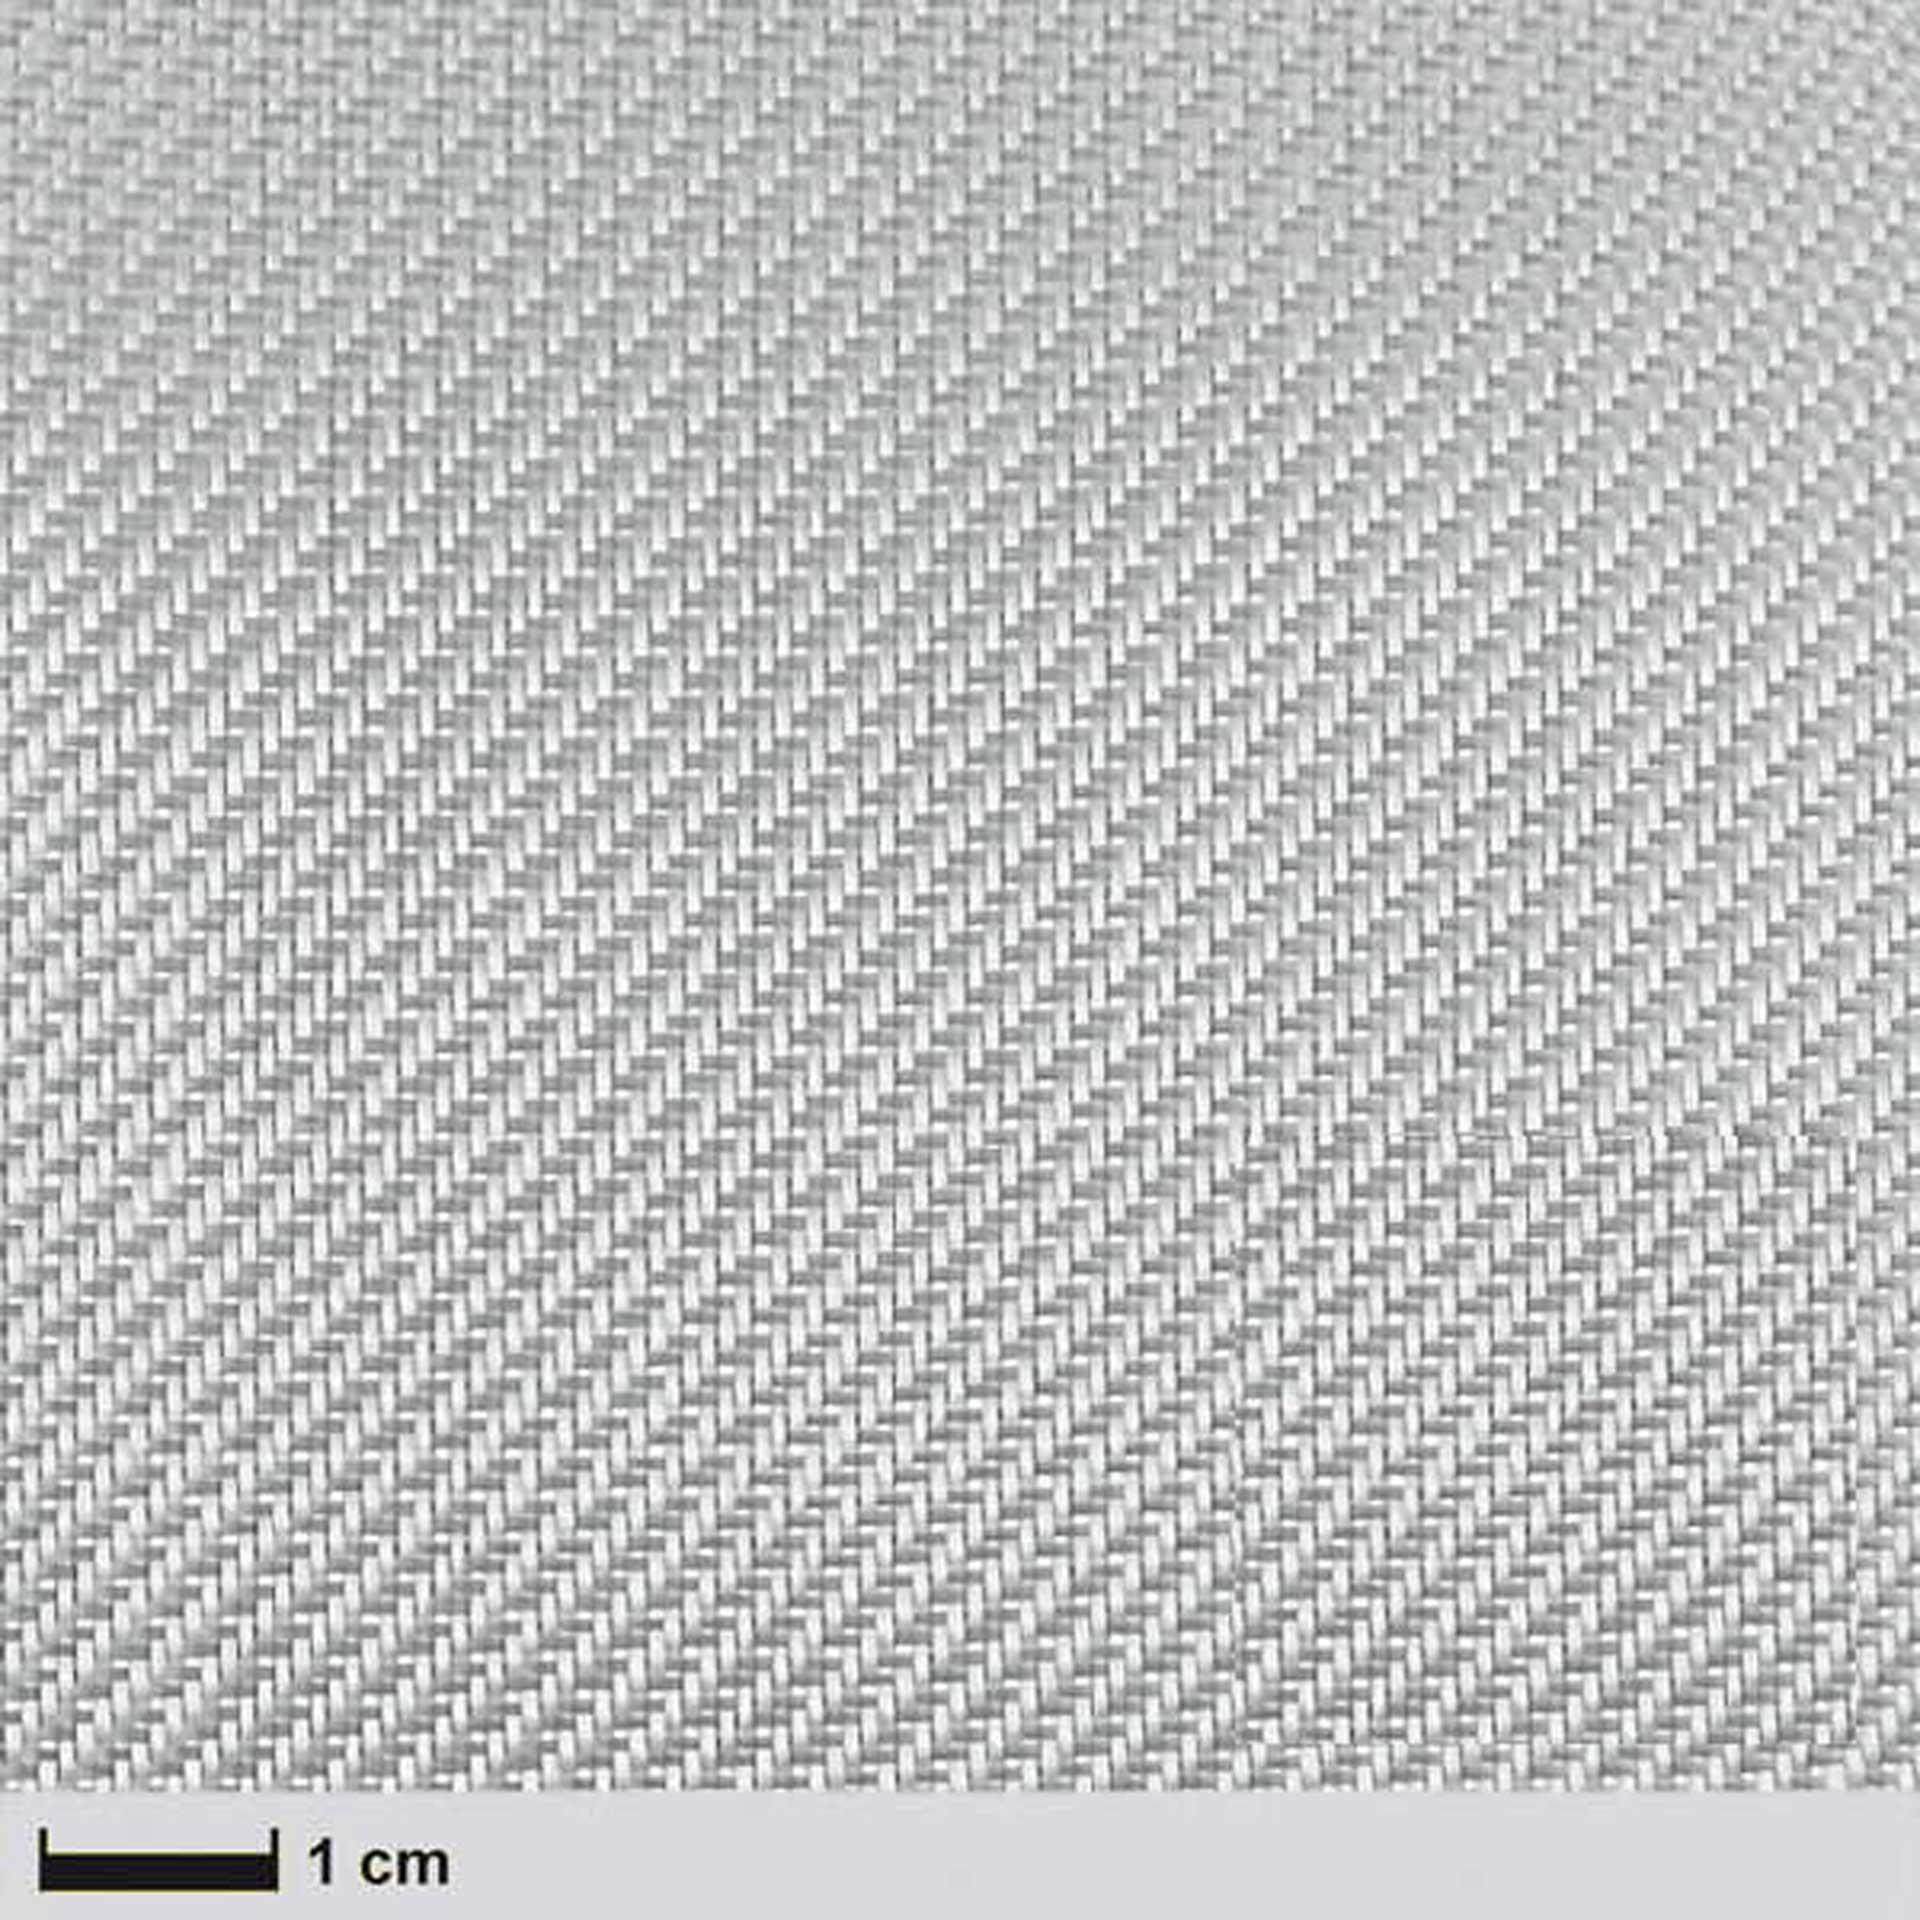 R&G Glasgewebe 160 g/m² (Köper) 100 cm, Rolle/ 10 m